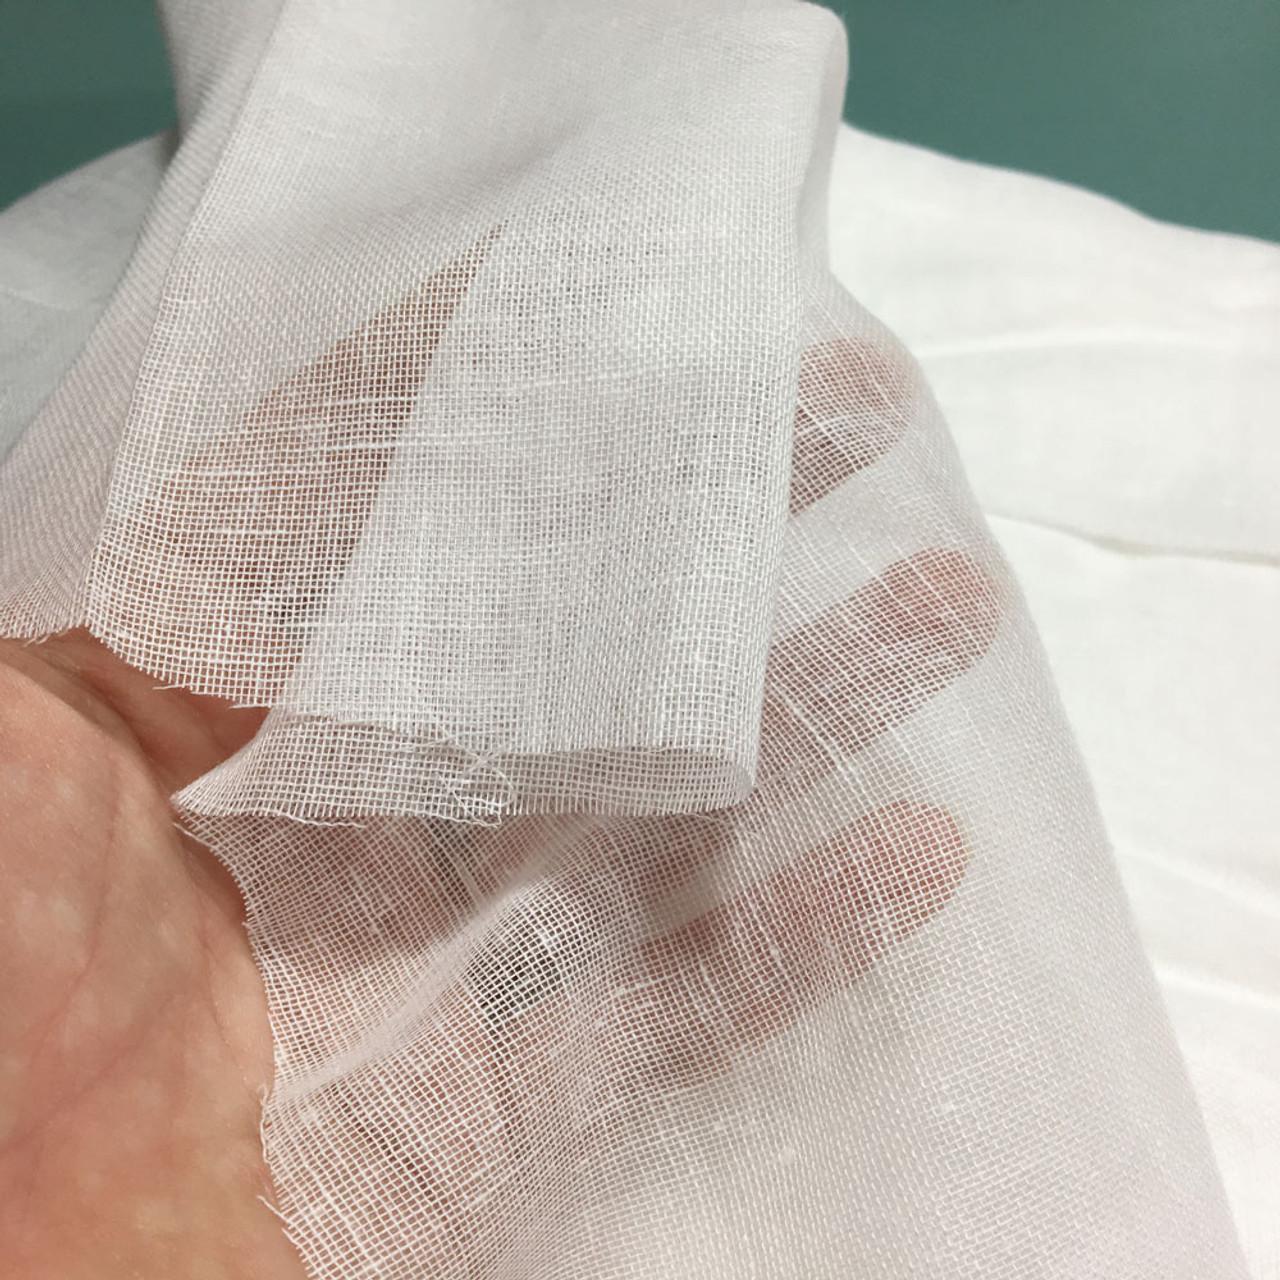 60 Yards White Tobacco Cloth Cotton Fabric - Lightweight